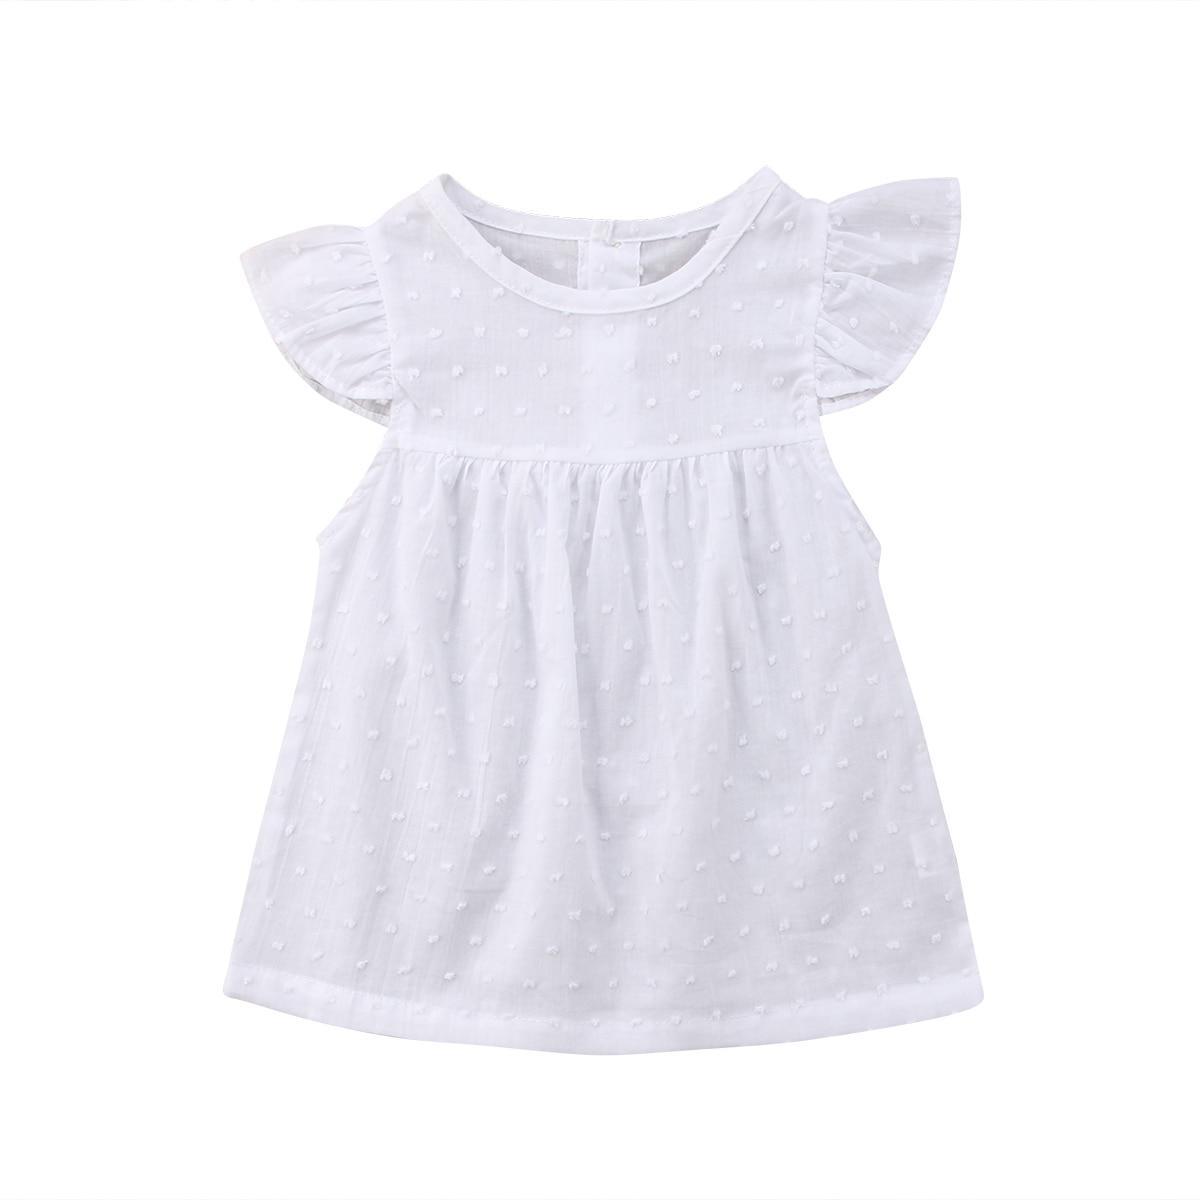 Pudcoco White Tutu Princess Baby Dress Toddler Infant Baby Girls Short Sleeves Dresses Summer  Praty Birthday Holiday Dress